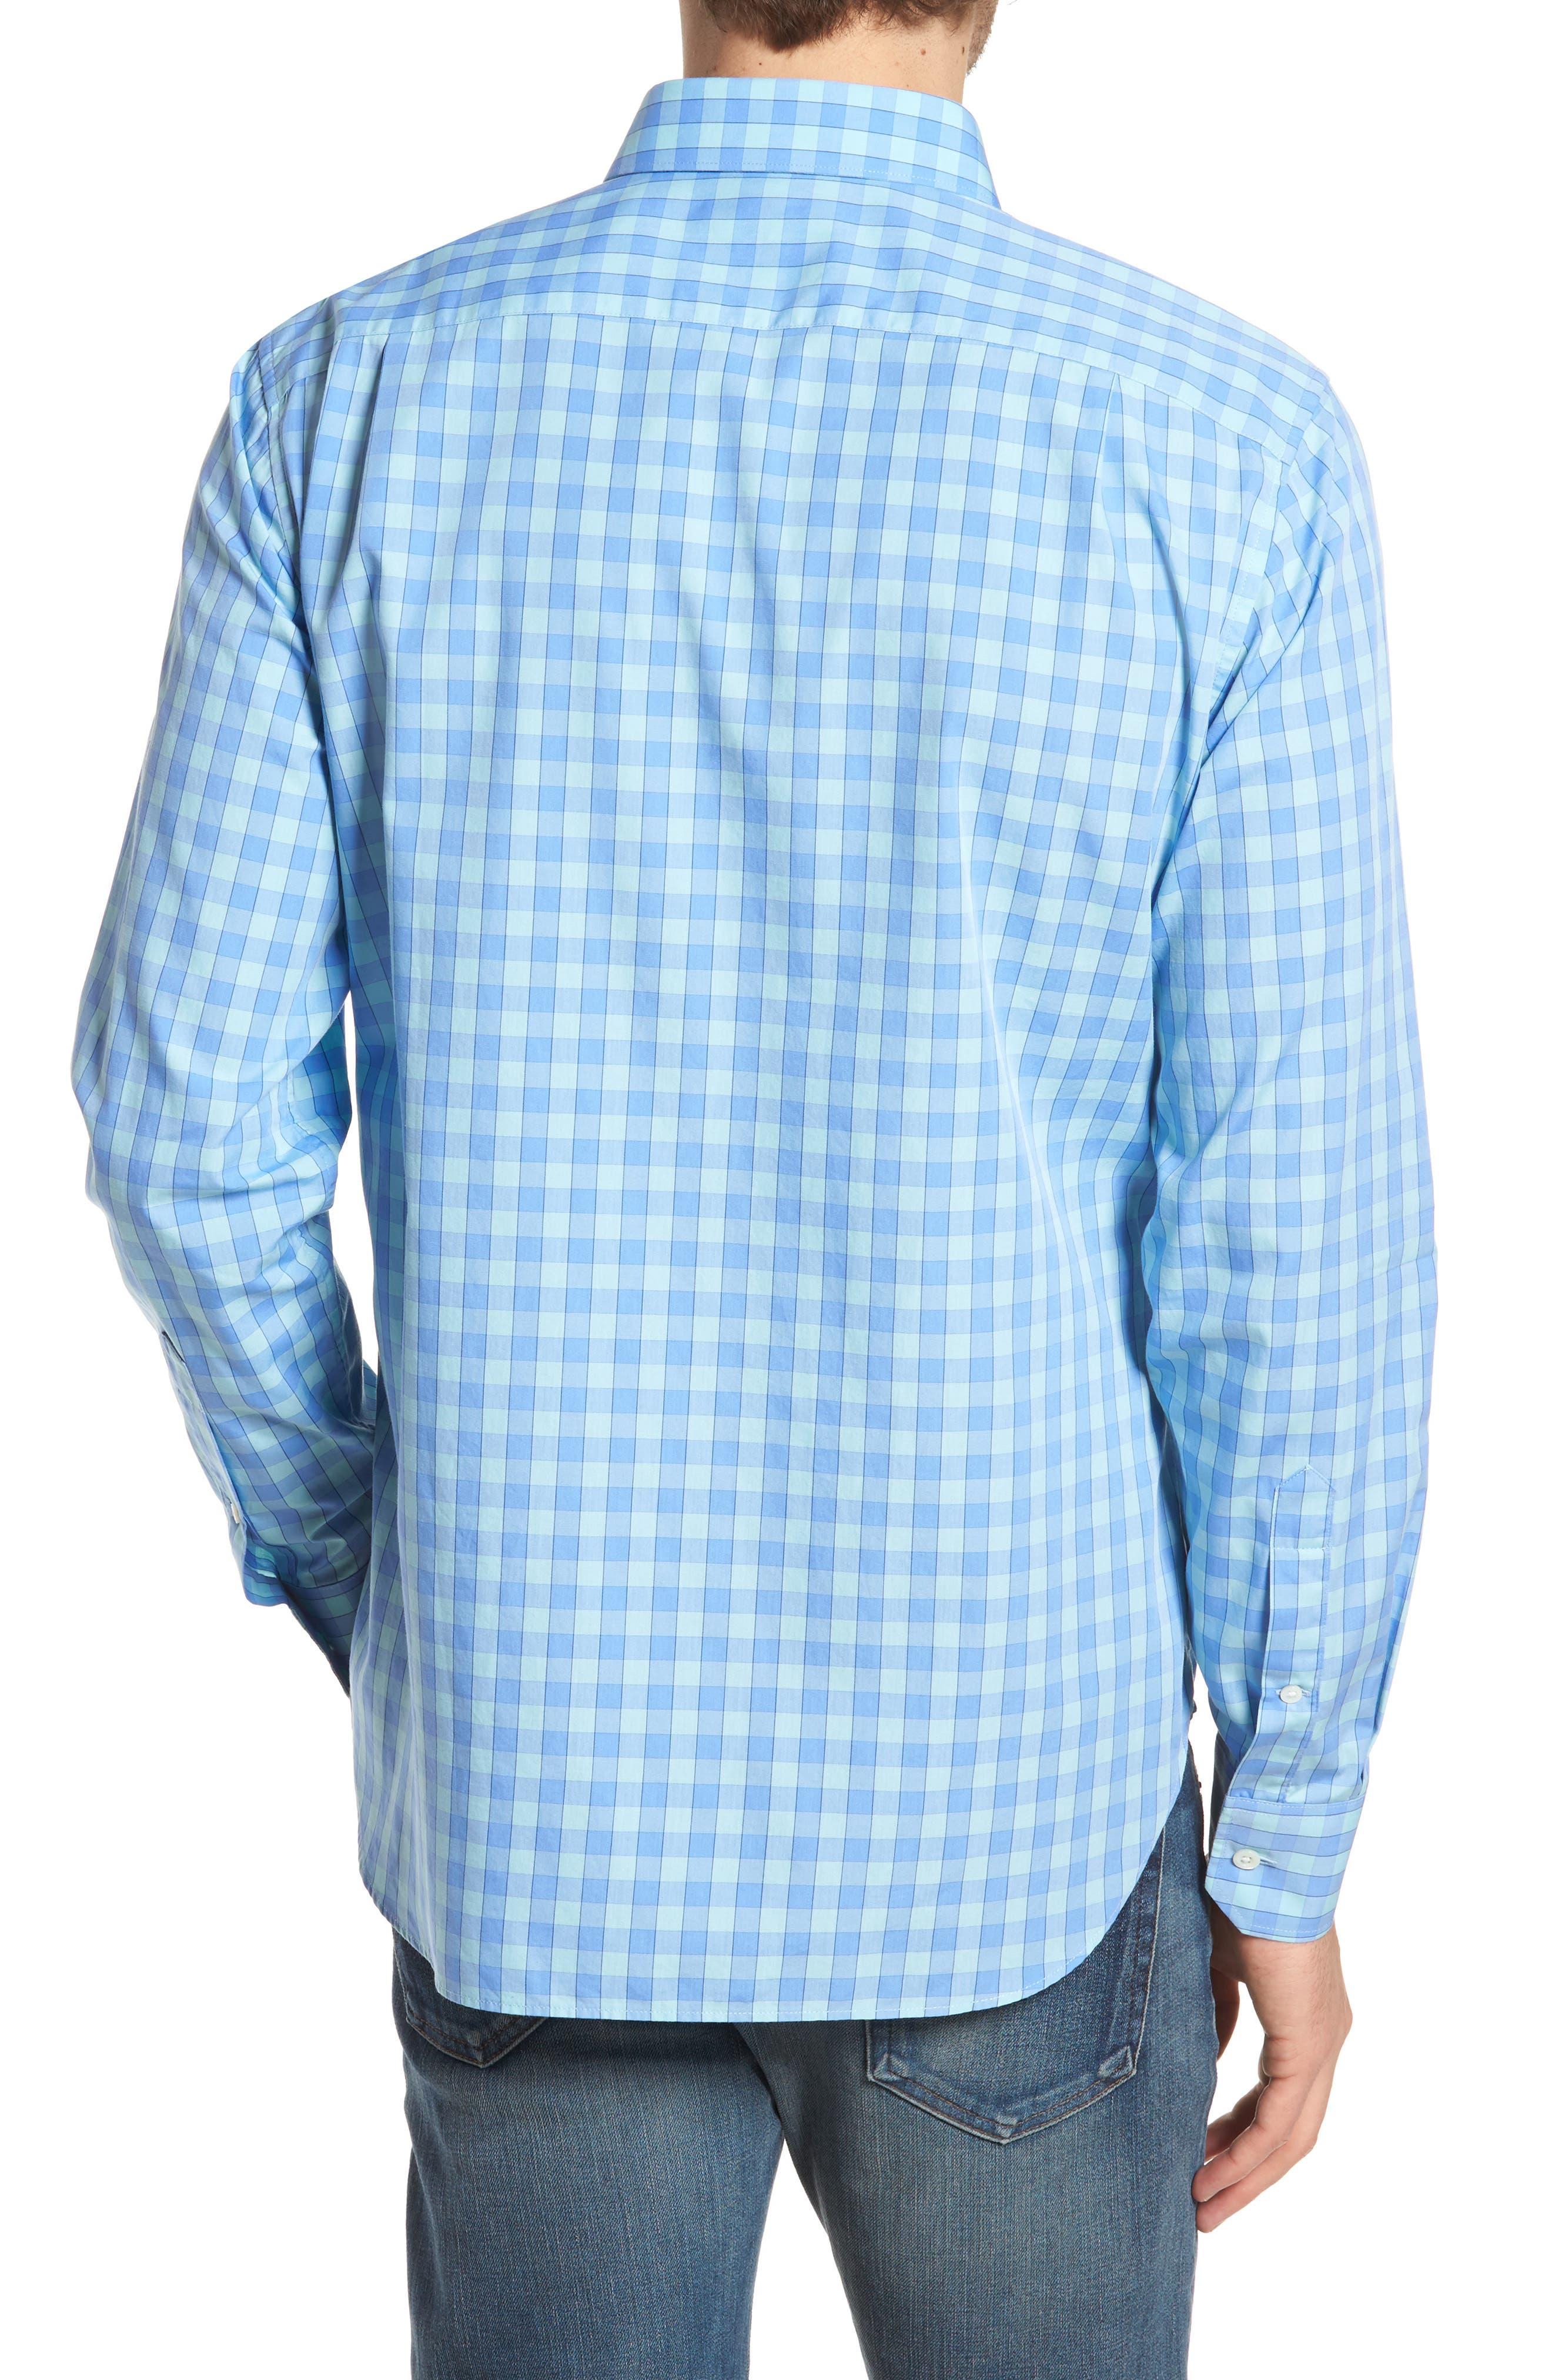 Unbutton Down 2.0 Slim Fit Gingham Sport Shirt,                             Alternate thumbnail 3, color,                             Sail Boat Gingham/ Island